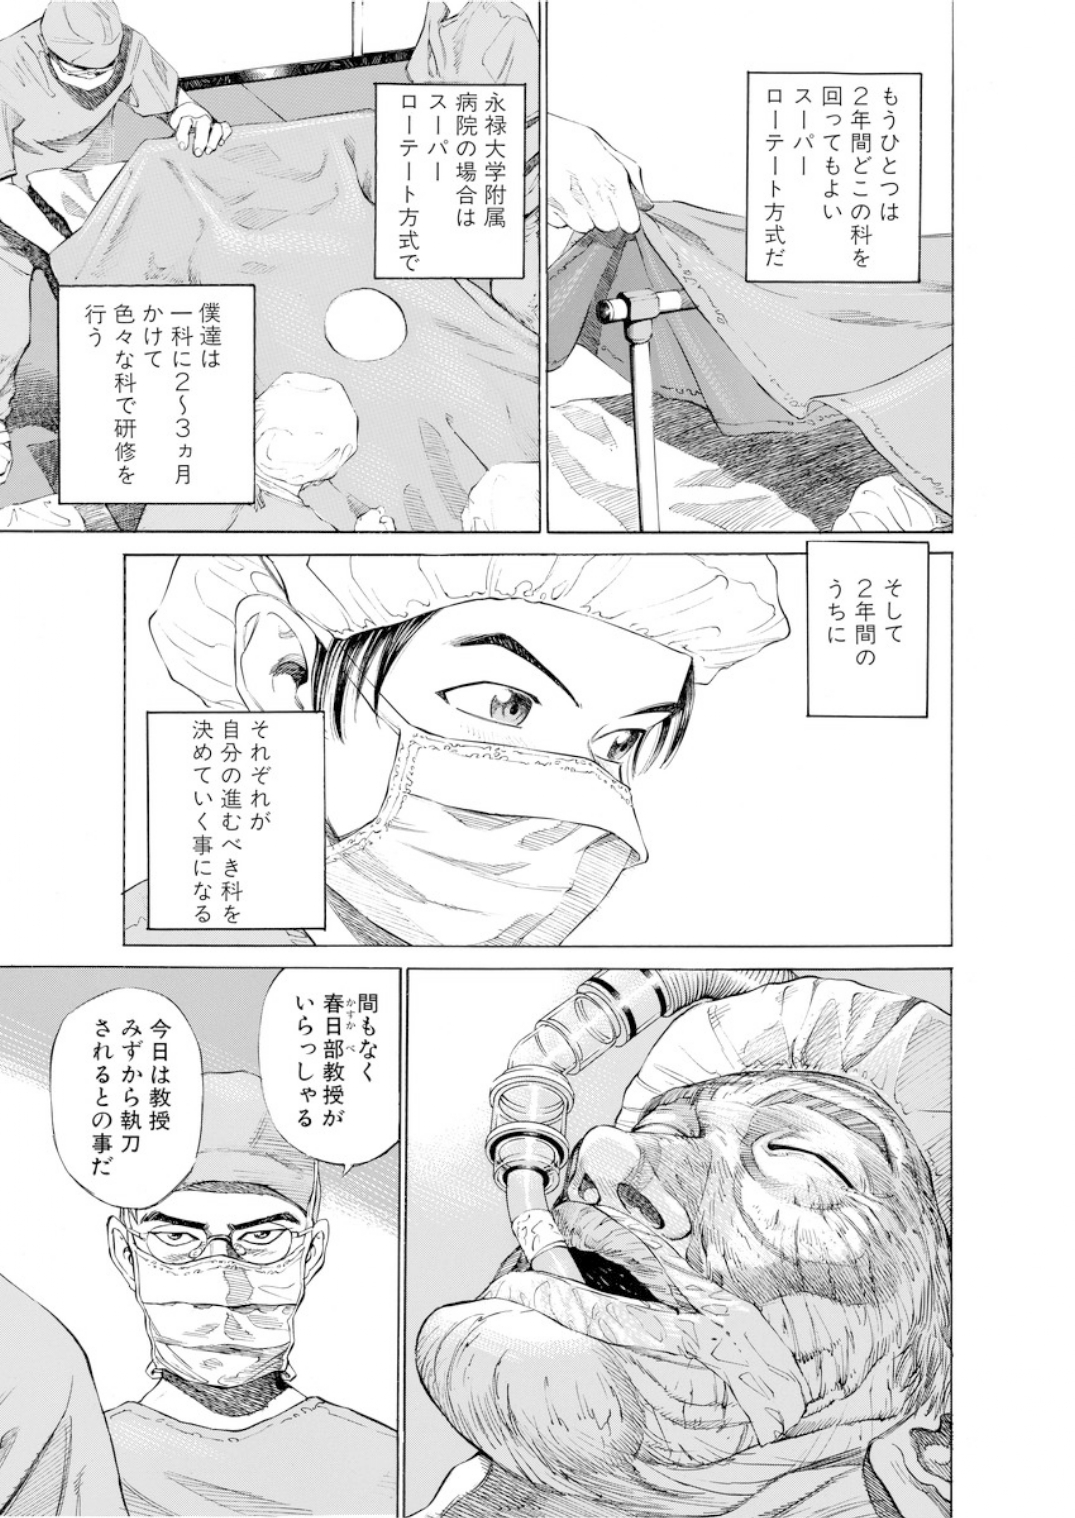 001bj_page-0069.jpg